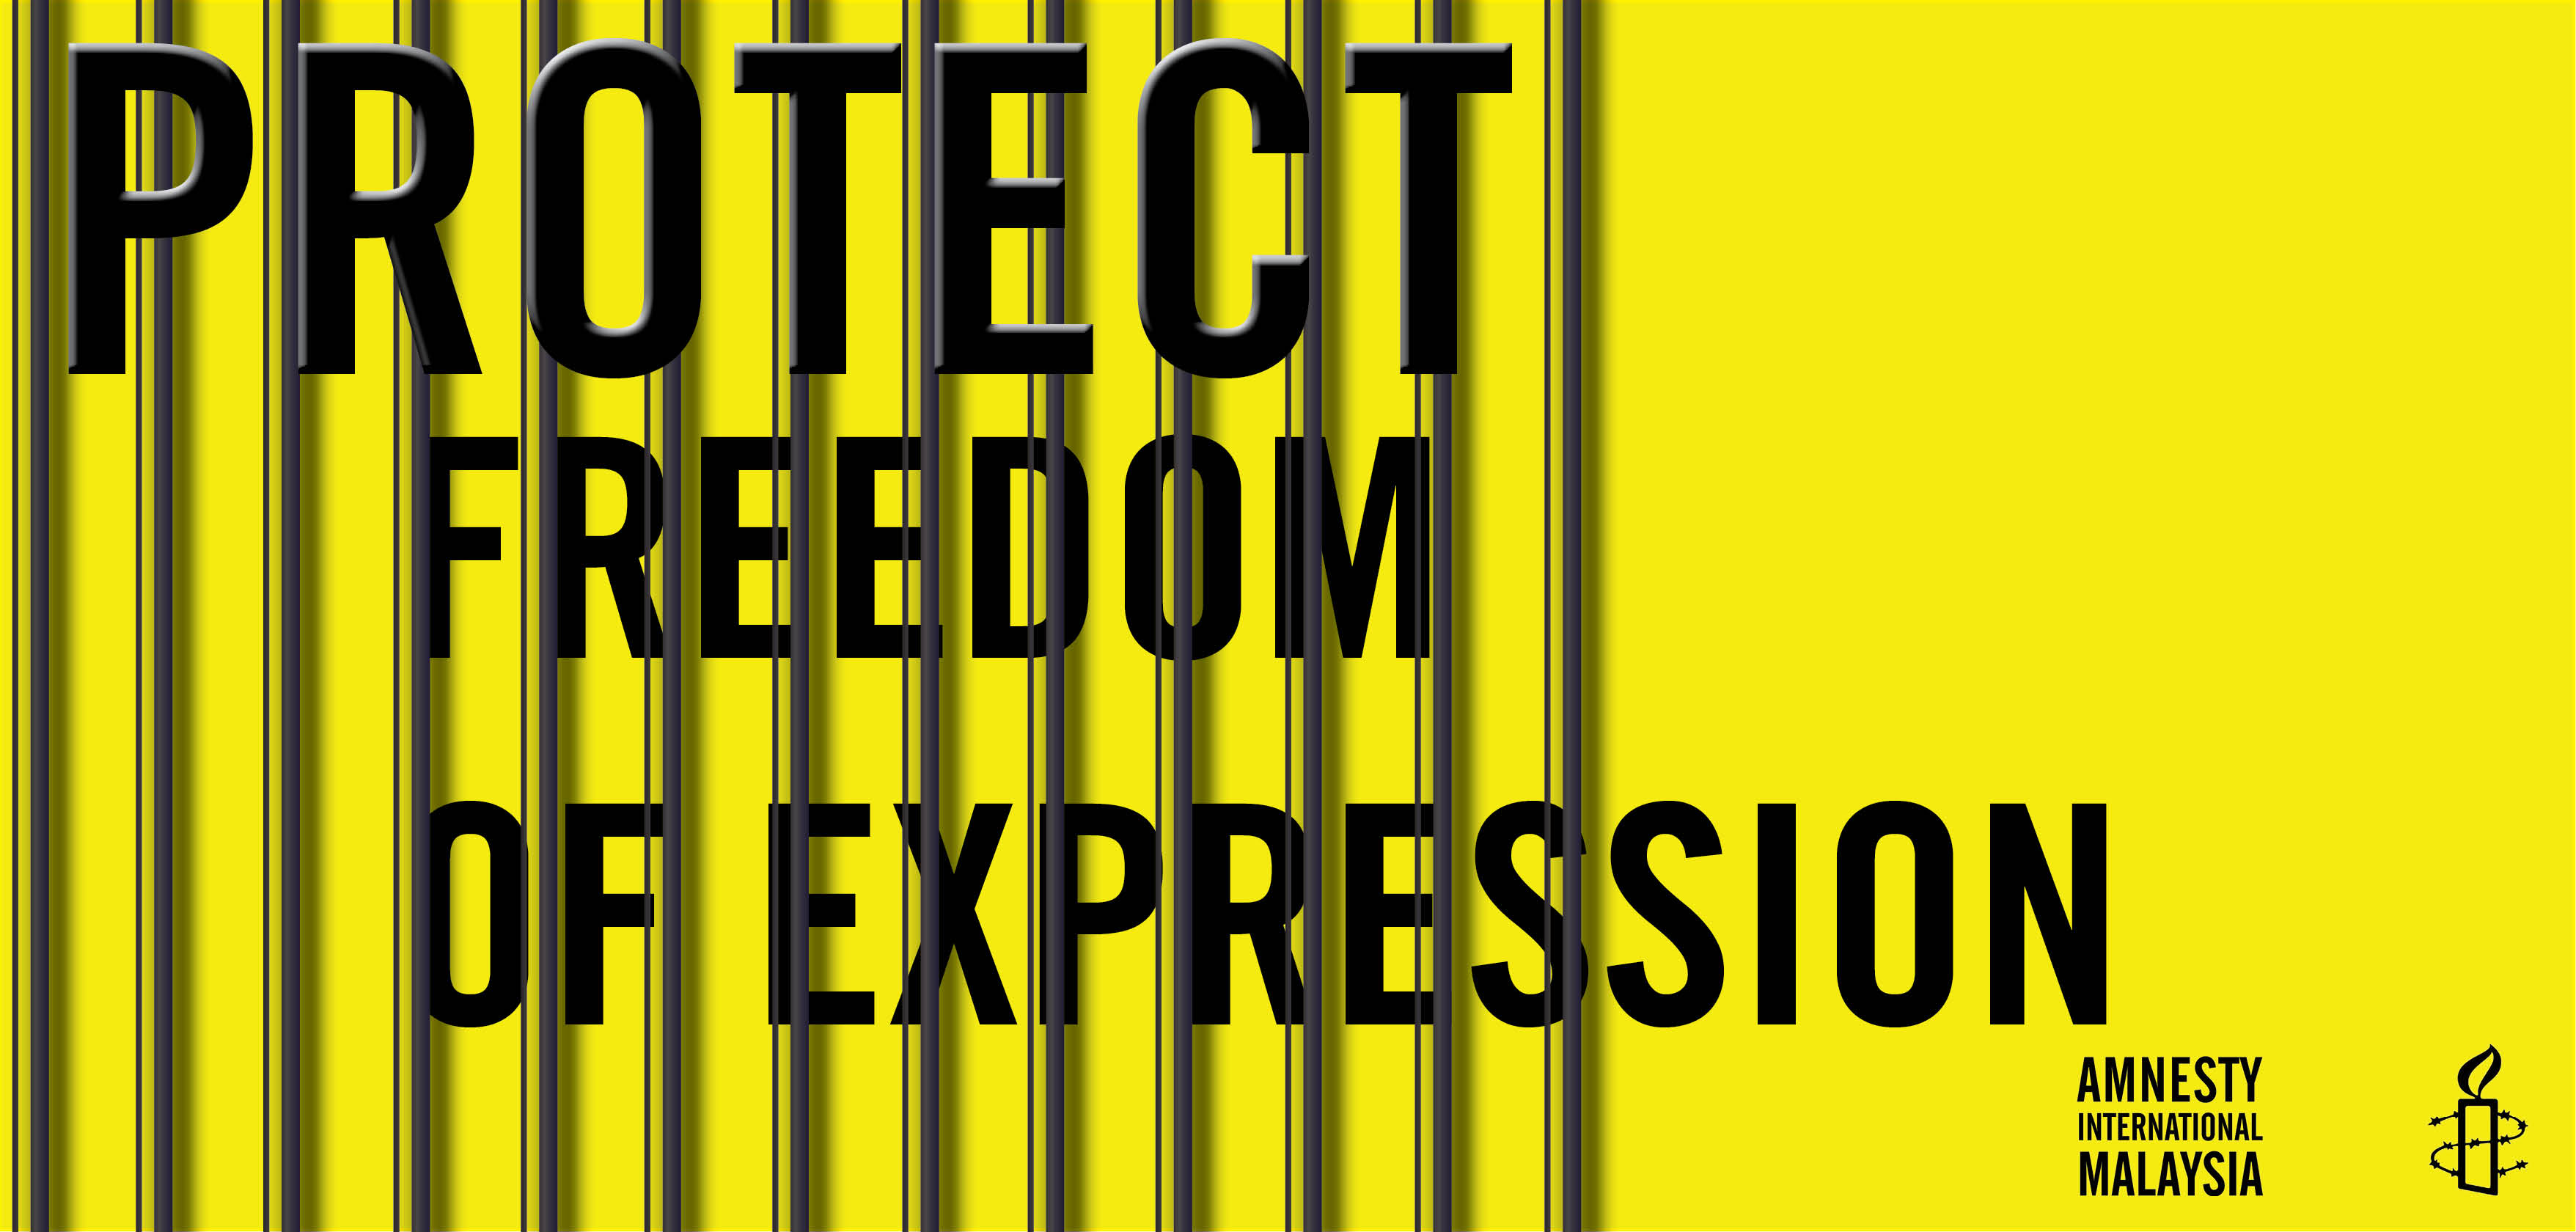 Freedom of Expression – Amnesty International Malaysia